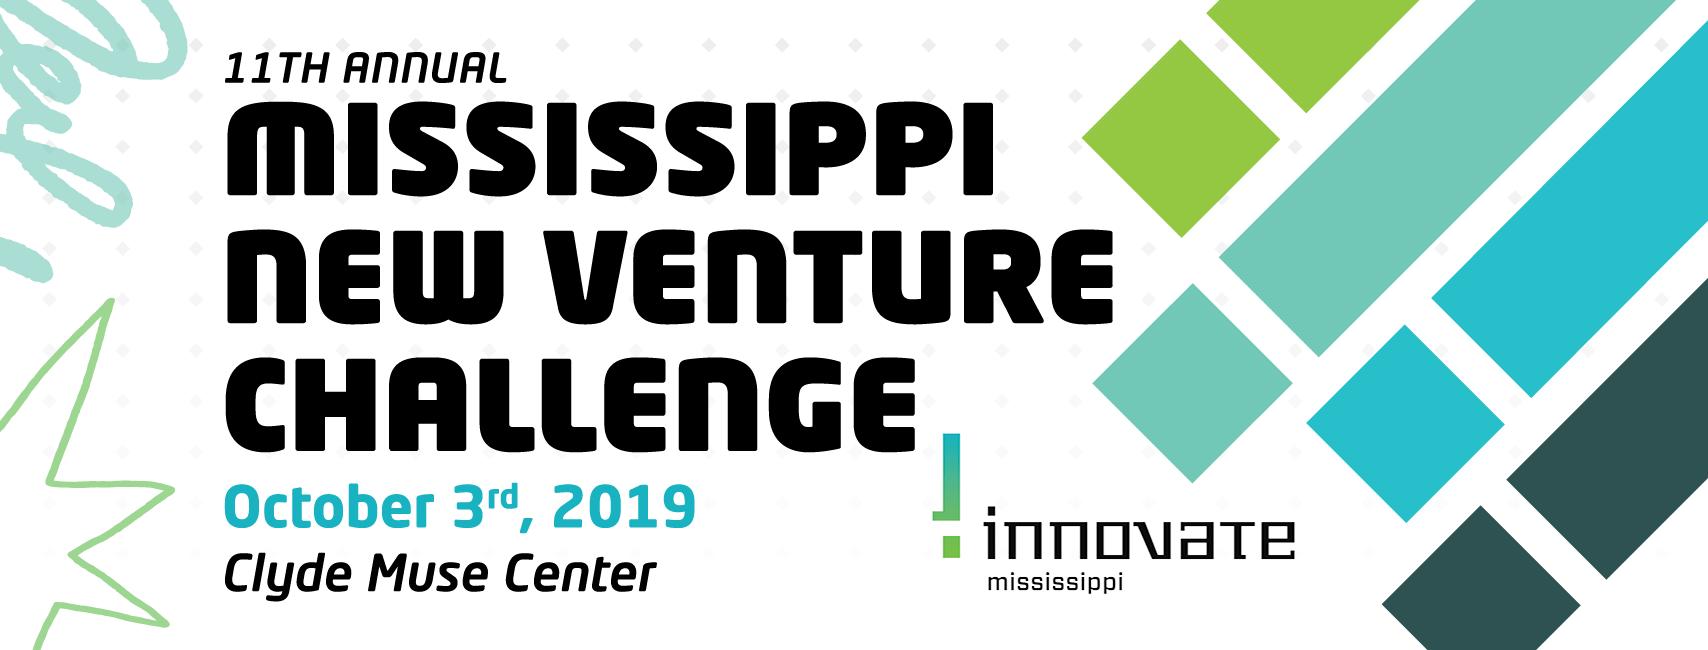 Mississippi New Venture Challenge